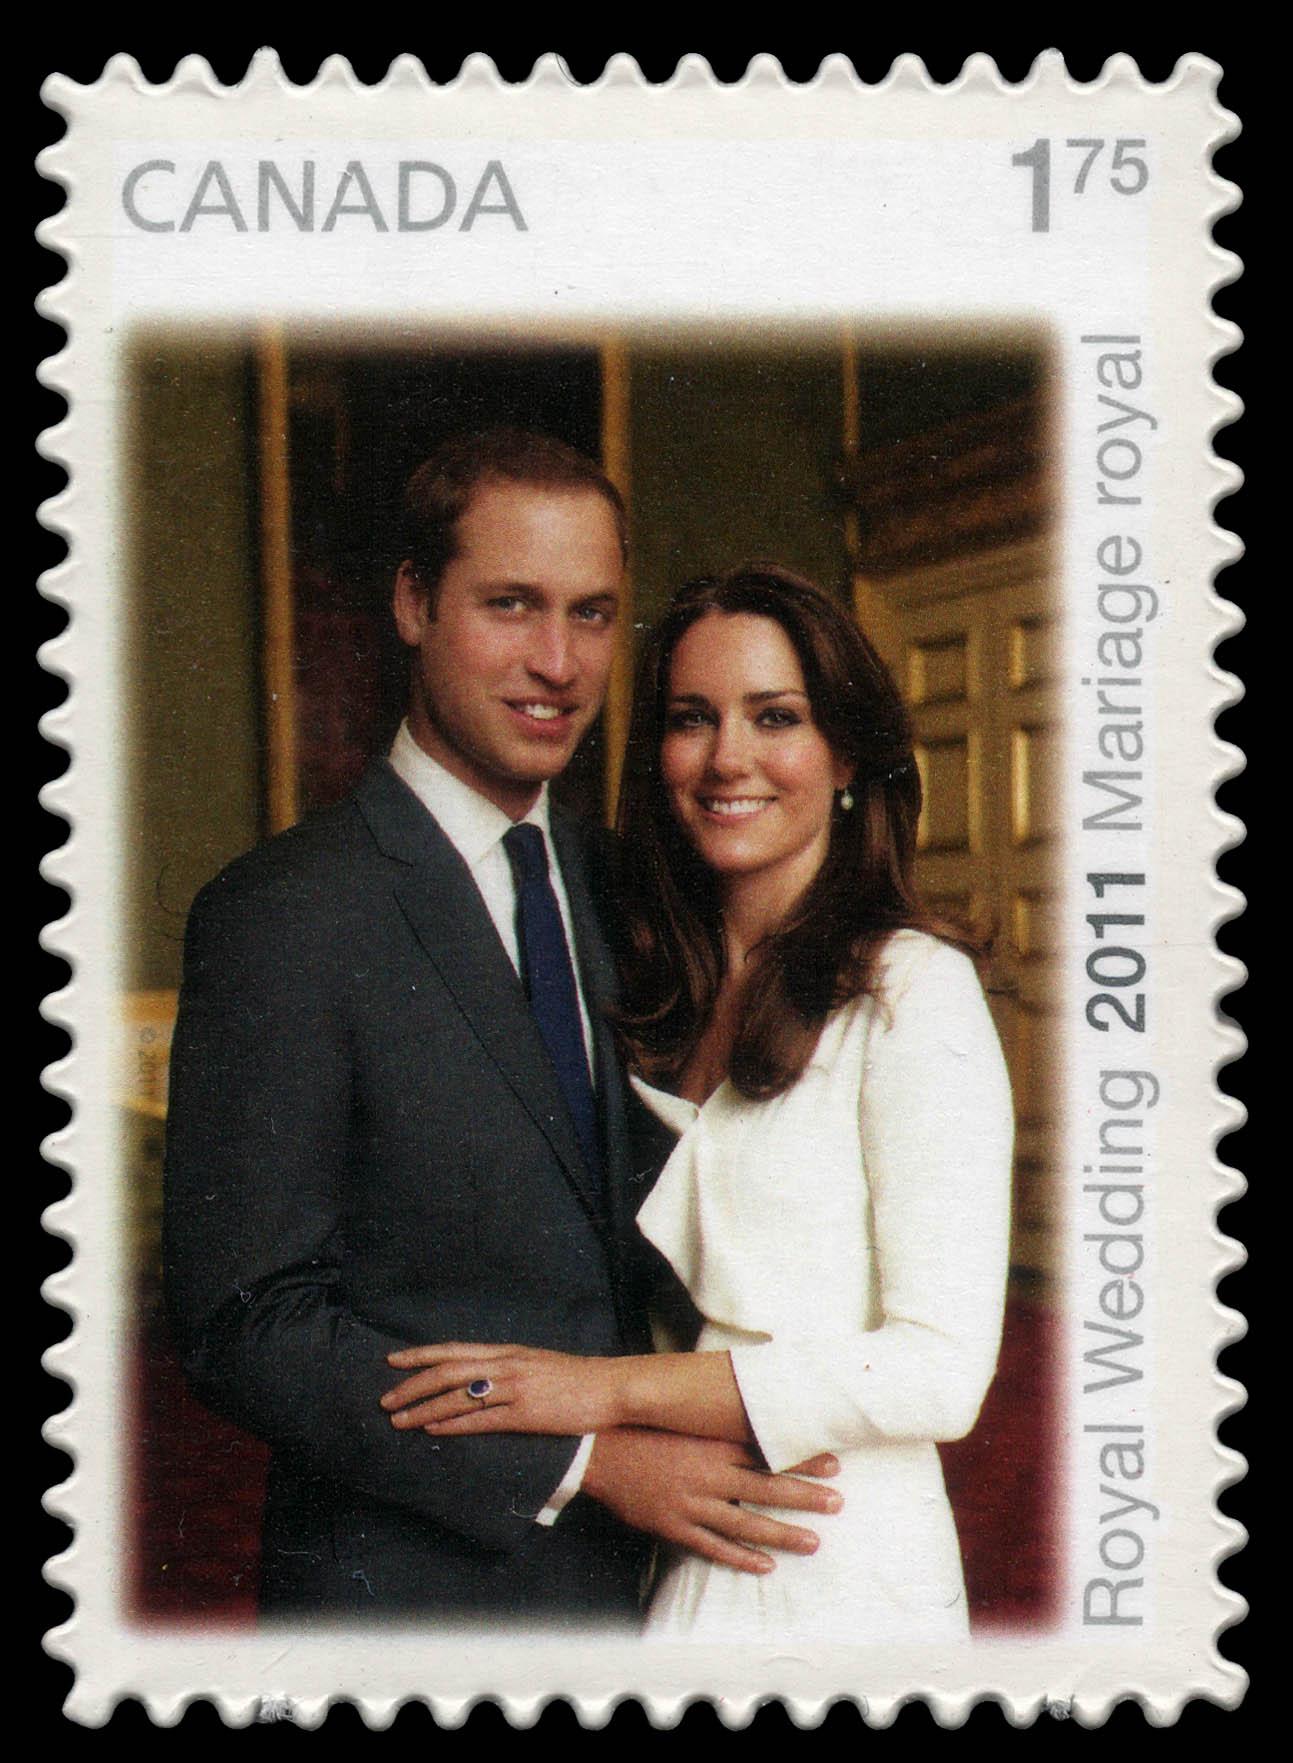 Royal Wedding 2011 - Engagement Canada Postage Stamp | The Royal Wedding